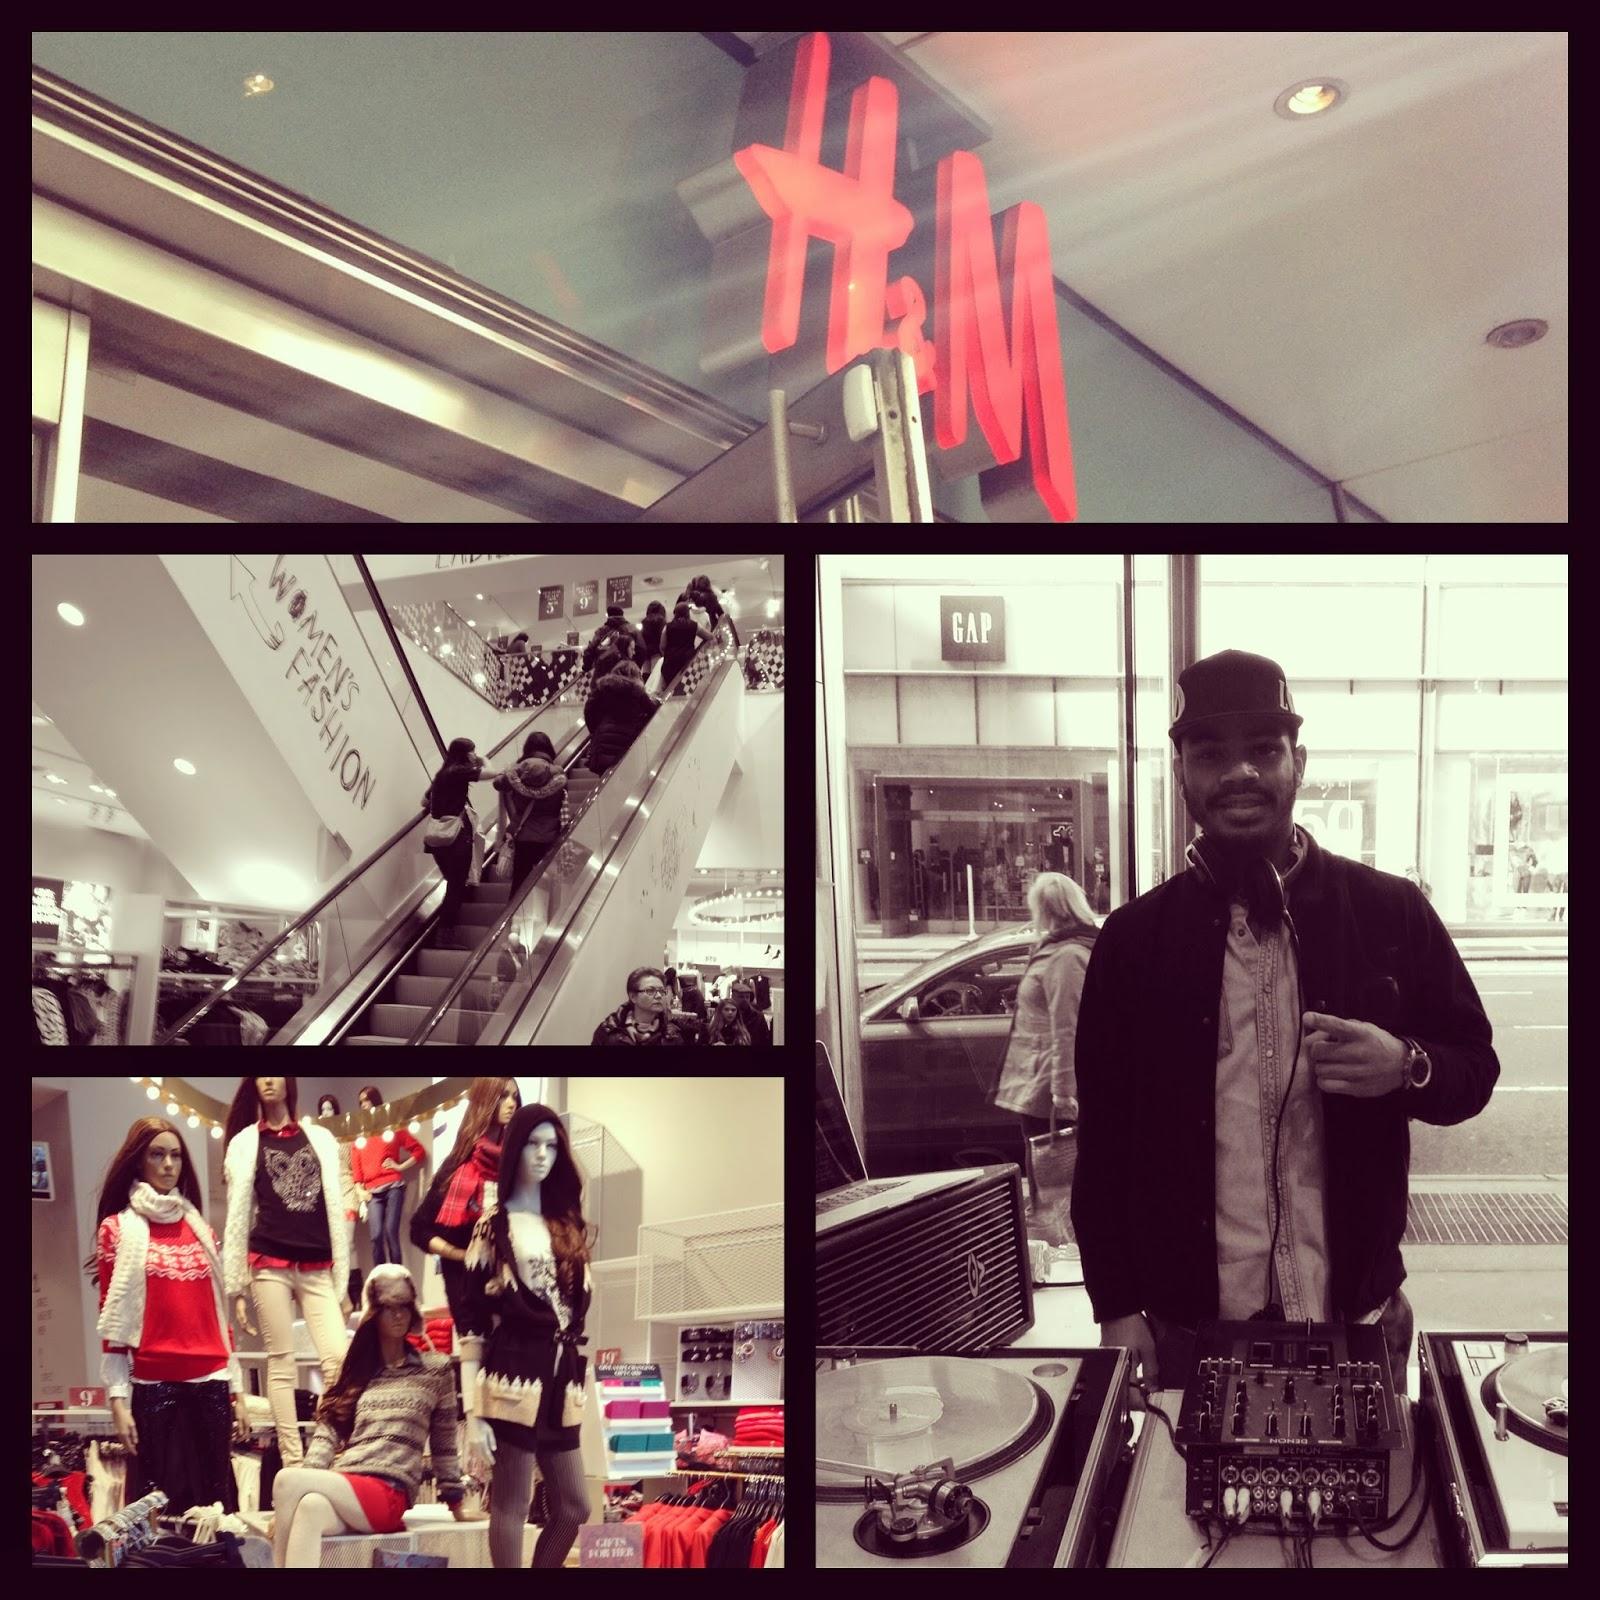 H & M - Midtown NYC   59th & Lexington  Friday, Nov. 29th  12pm-6pm   Black Friday Shopping Event   Feat. JONESY  #ScratchEvents